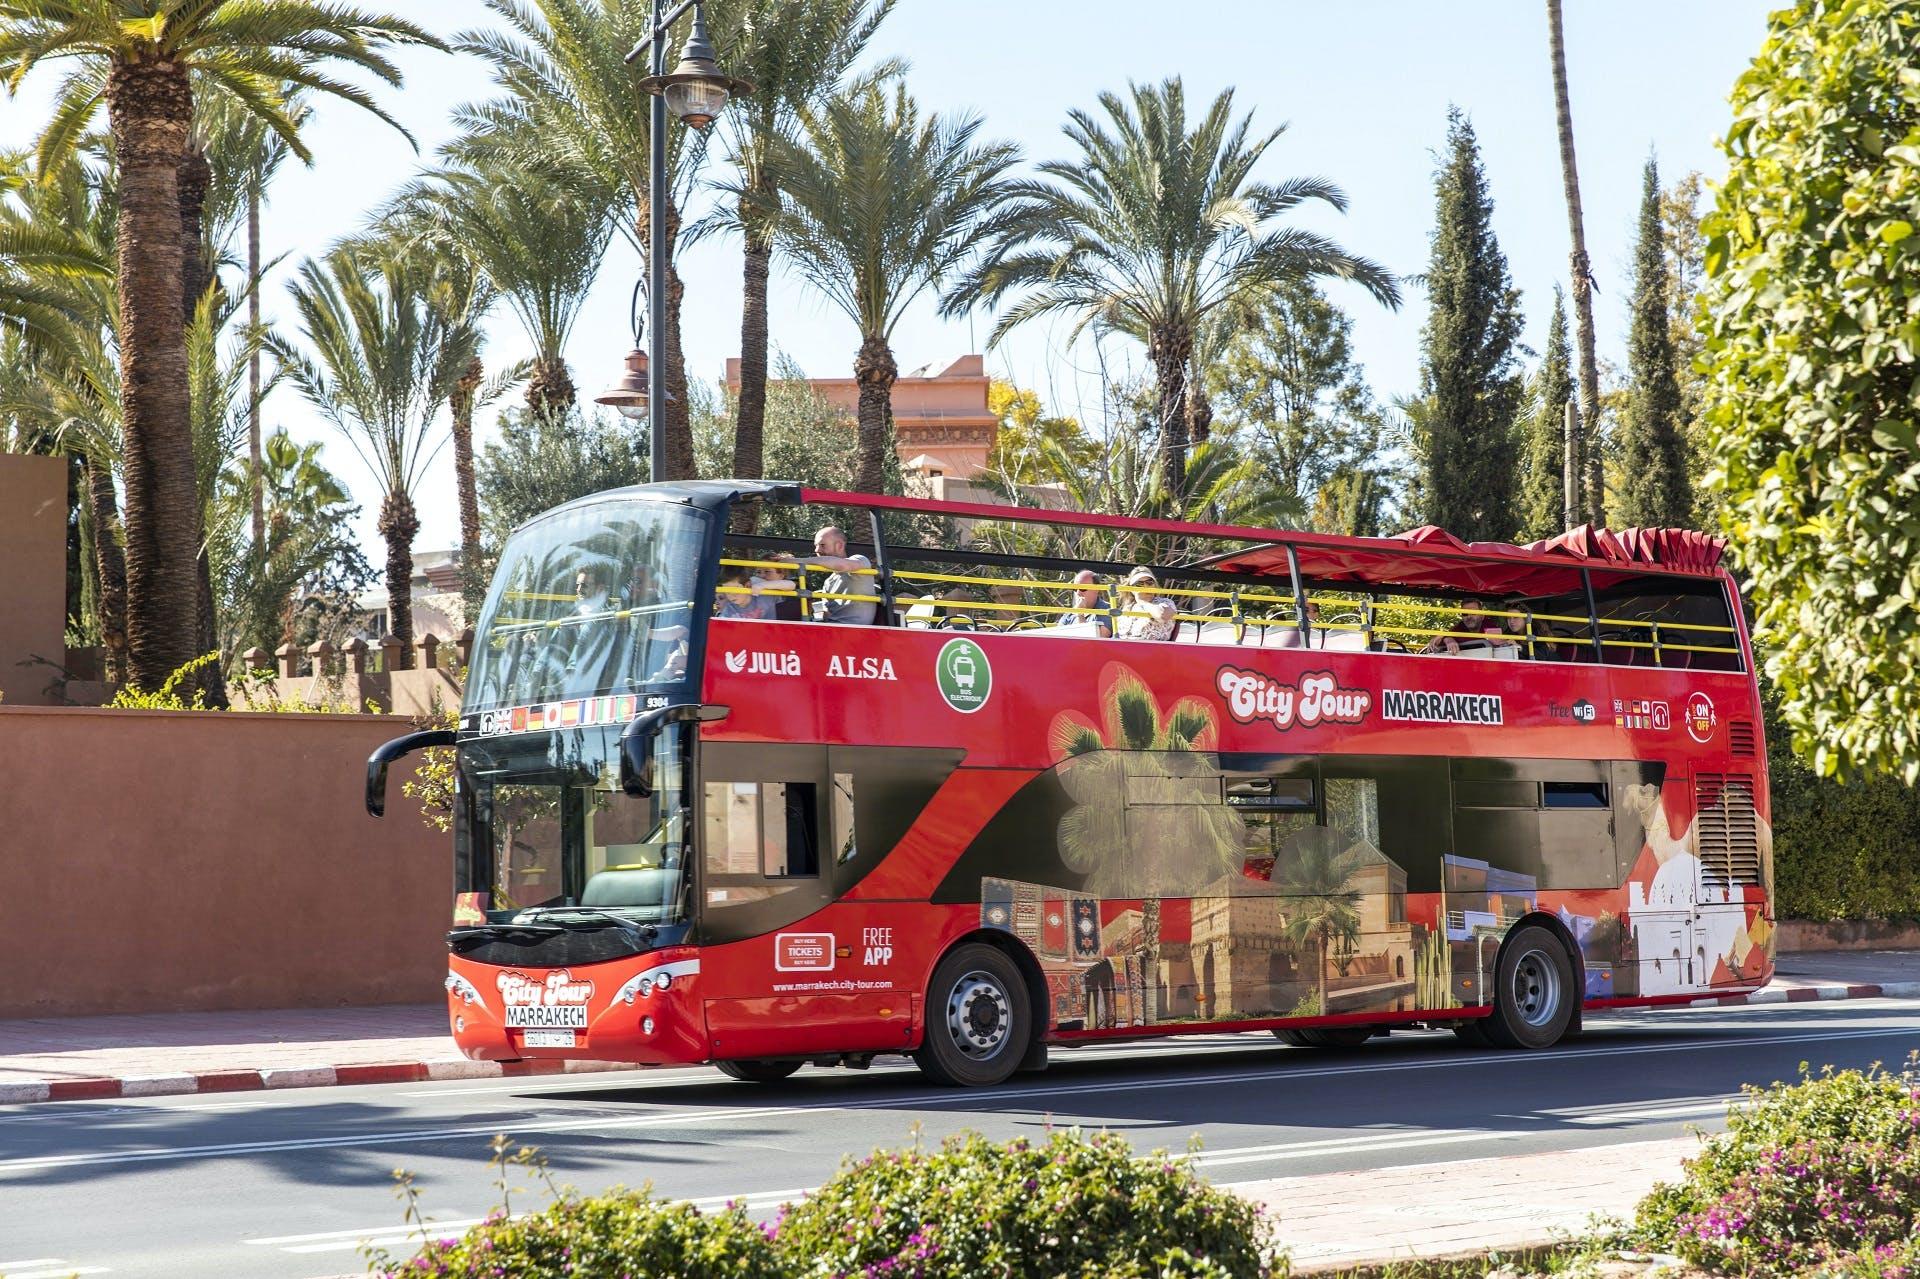 Marrakech city tour hop-on hop-off 2 day tickets